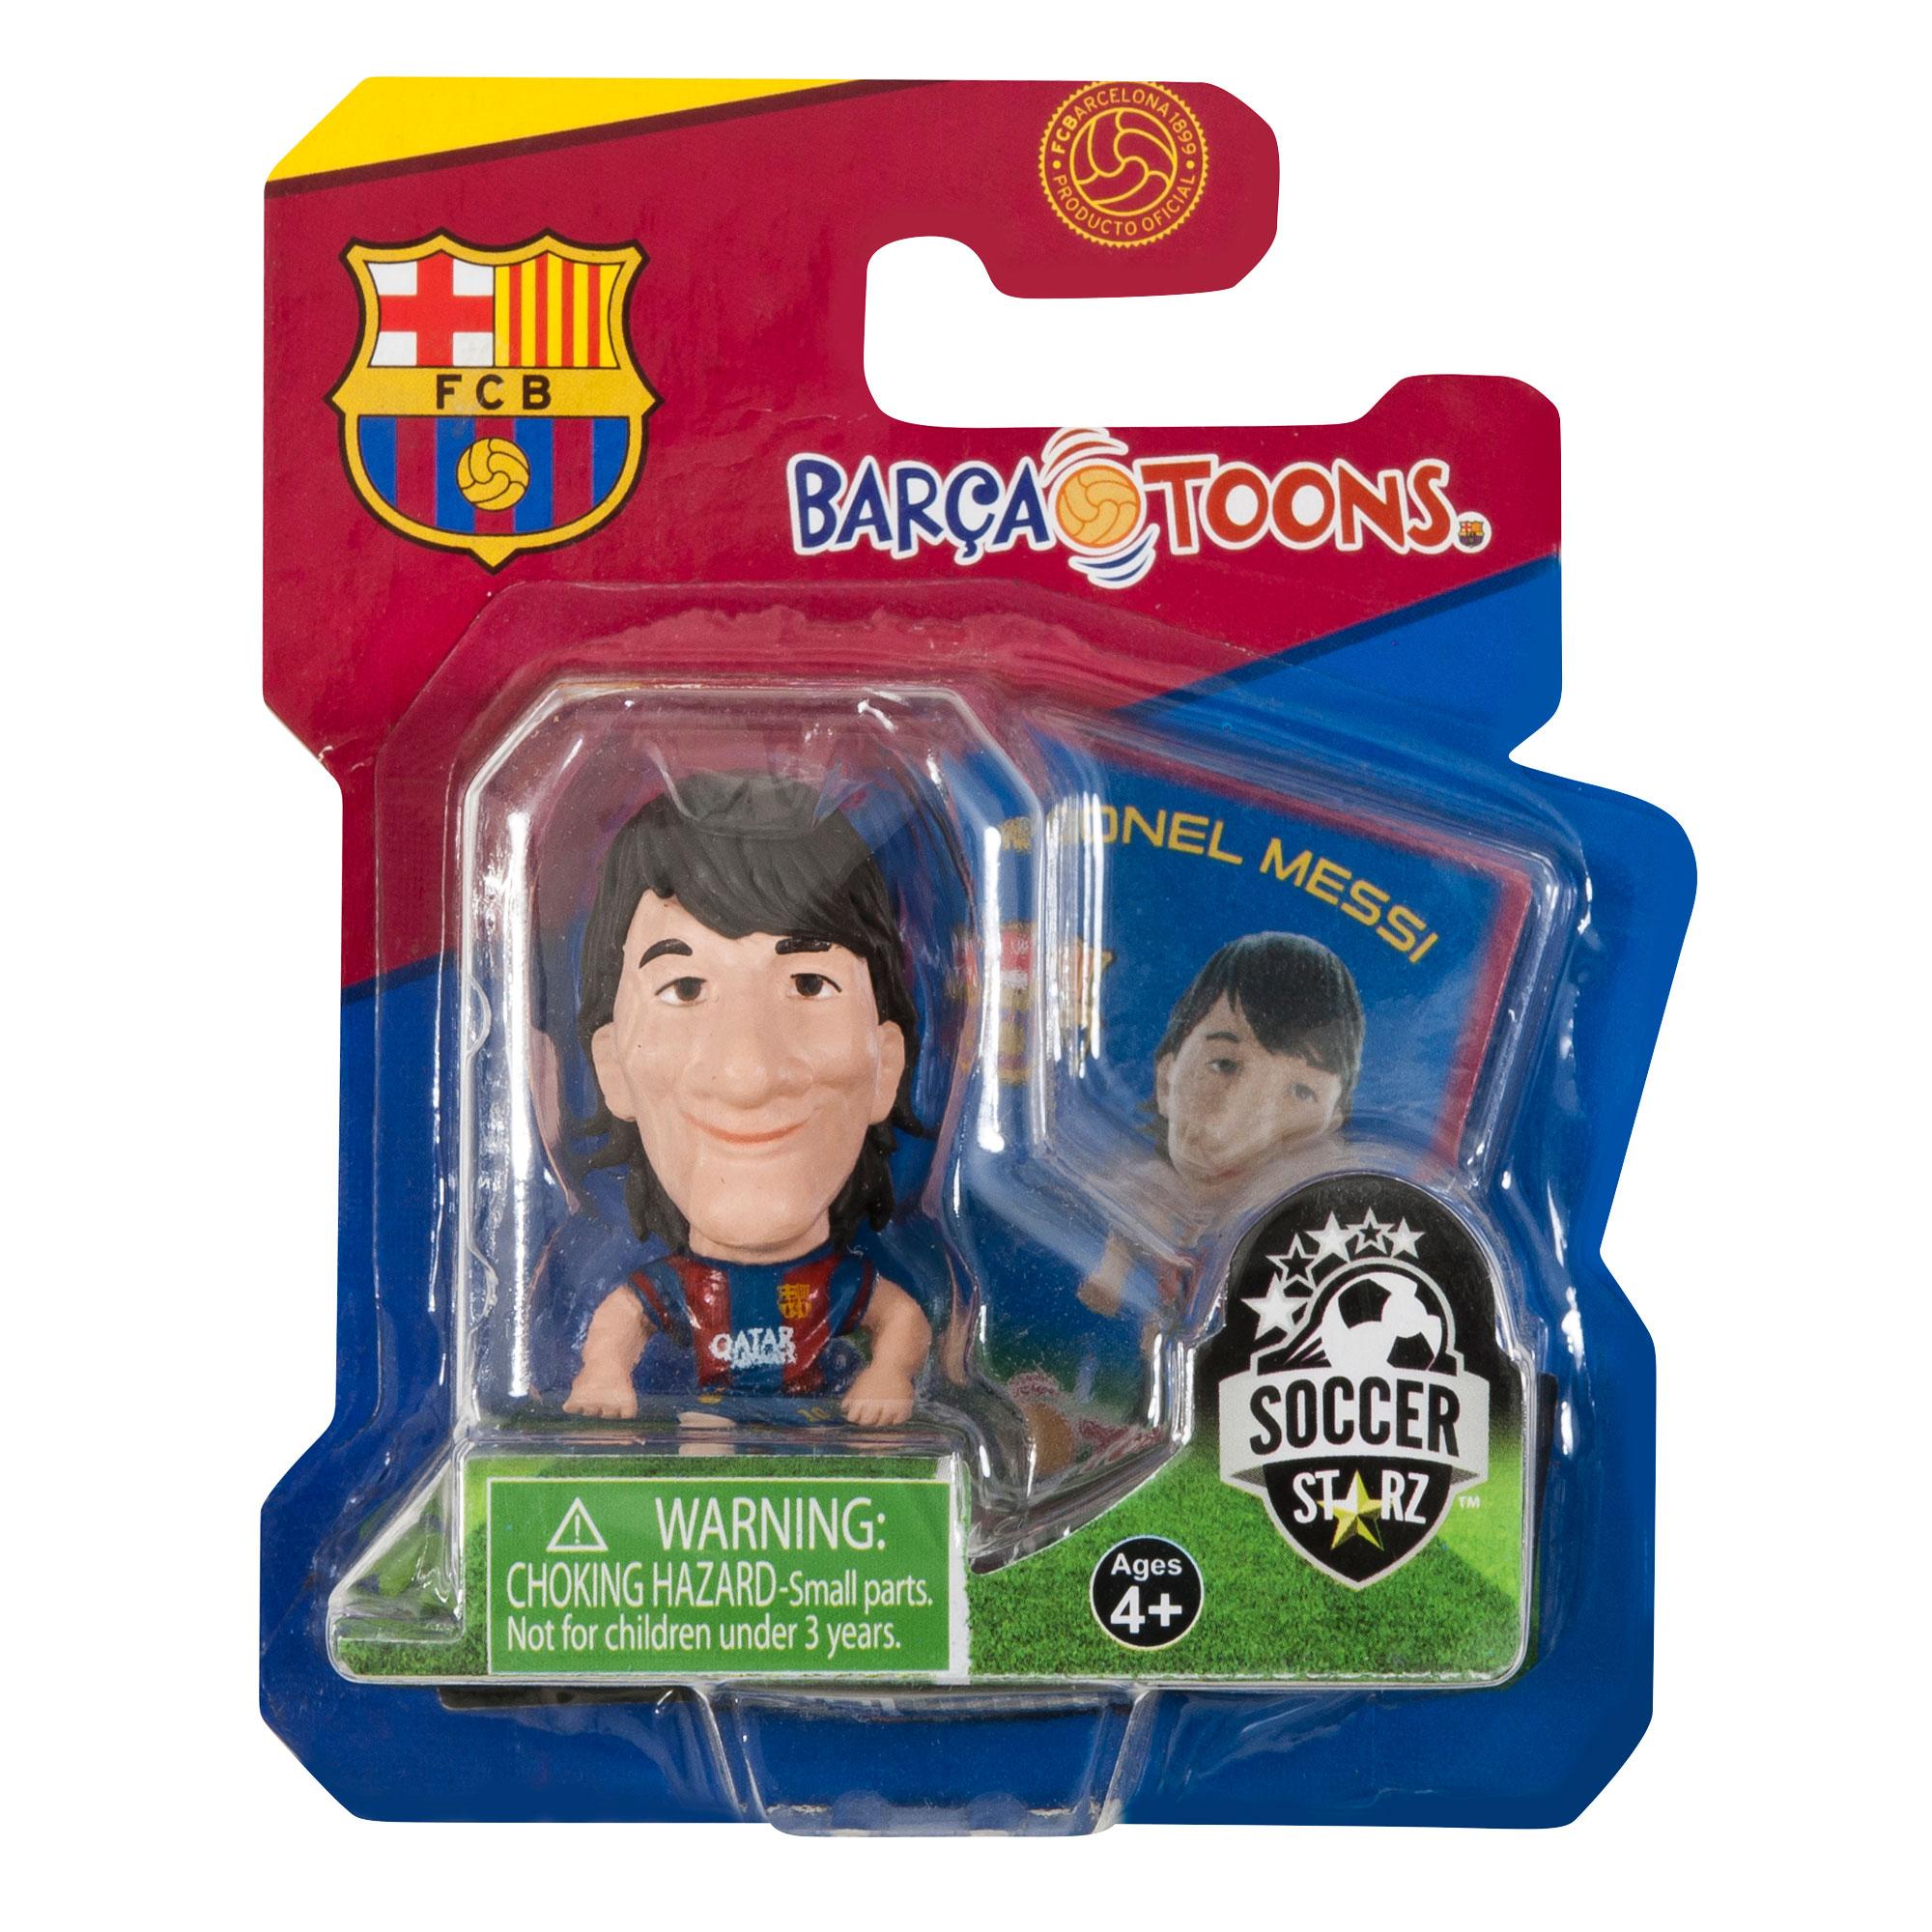 Barcelona Soccerstarz Barcatoons Messi 14-15 Home Kit